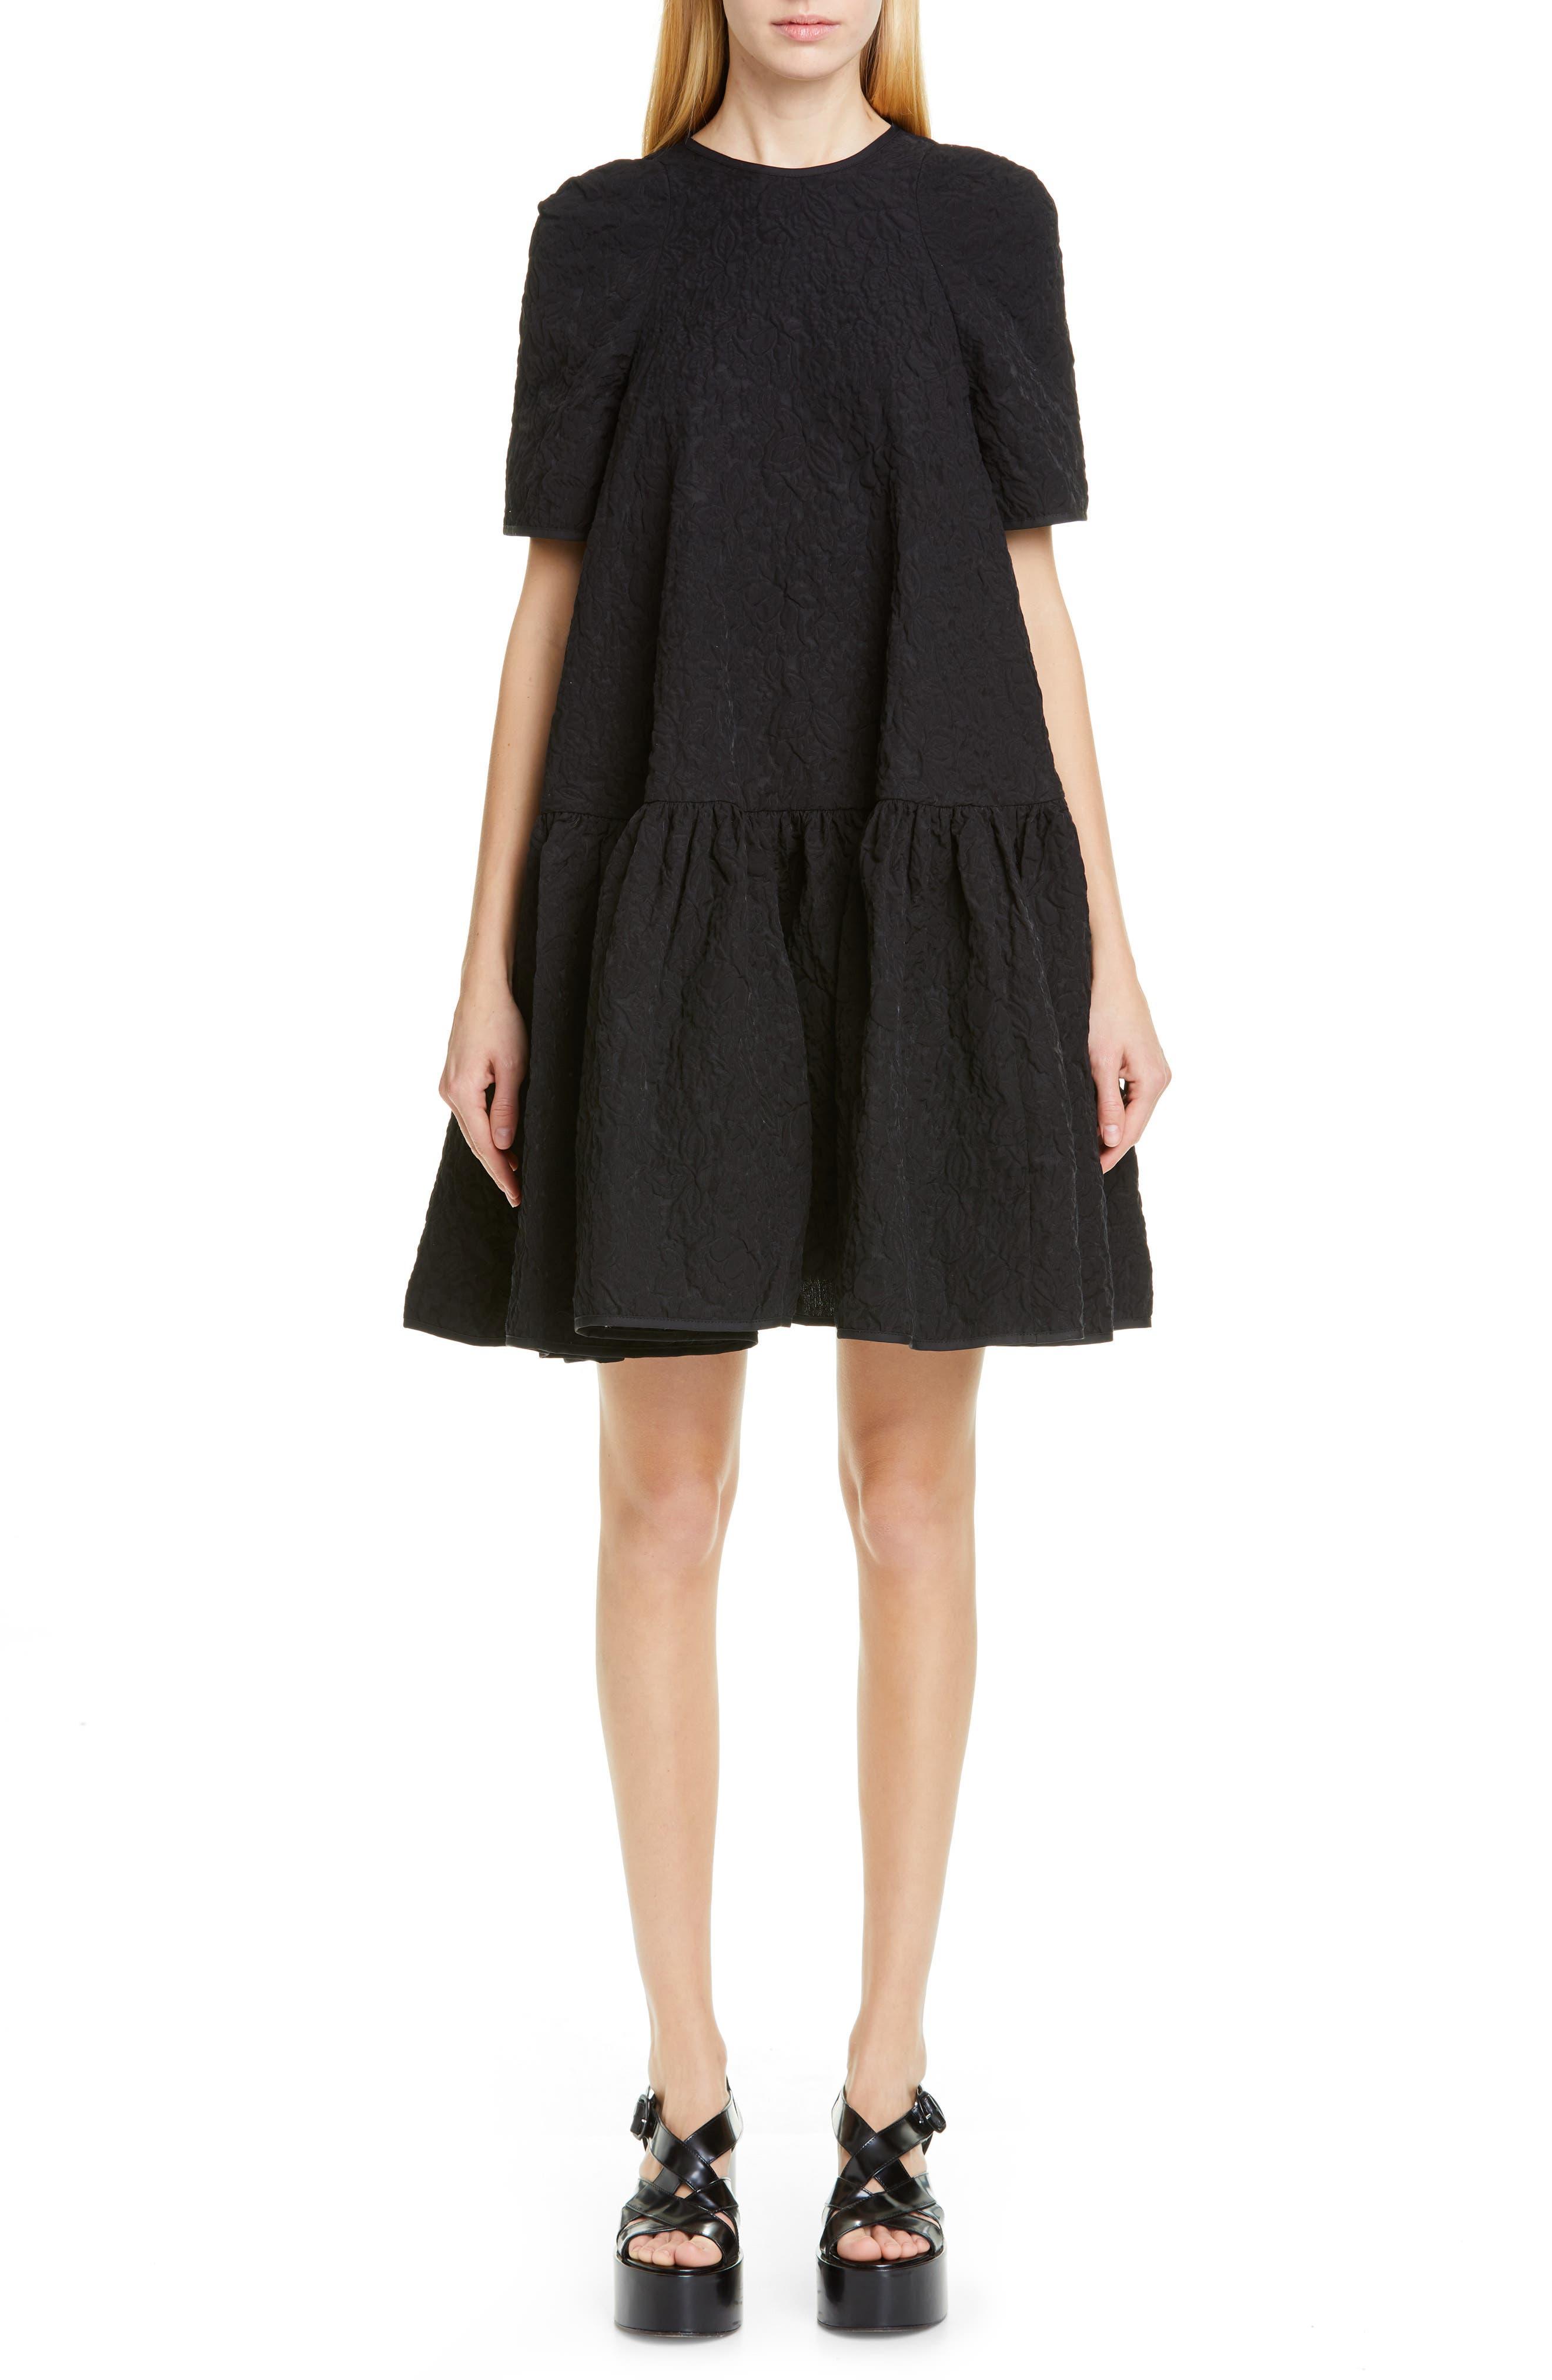 Cecilie Bahnsen Annabella Floral Matelasse Dress, US / 10 UK - Black